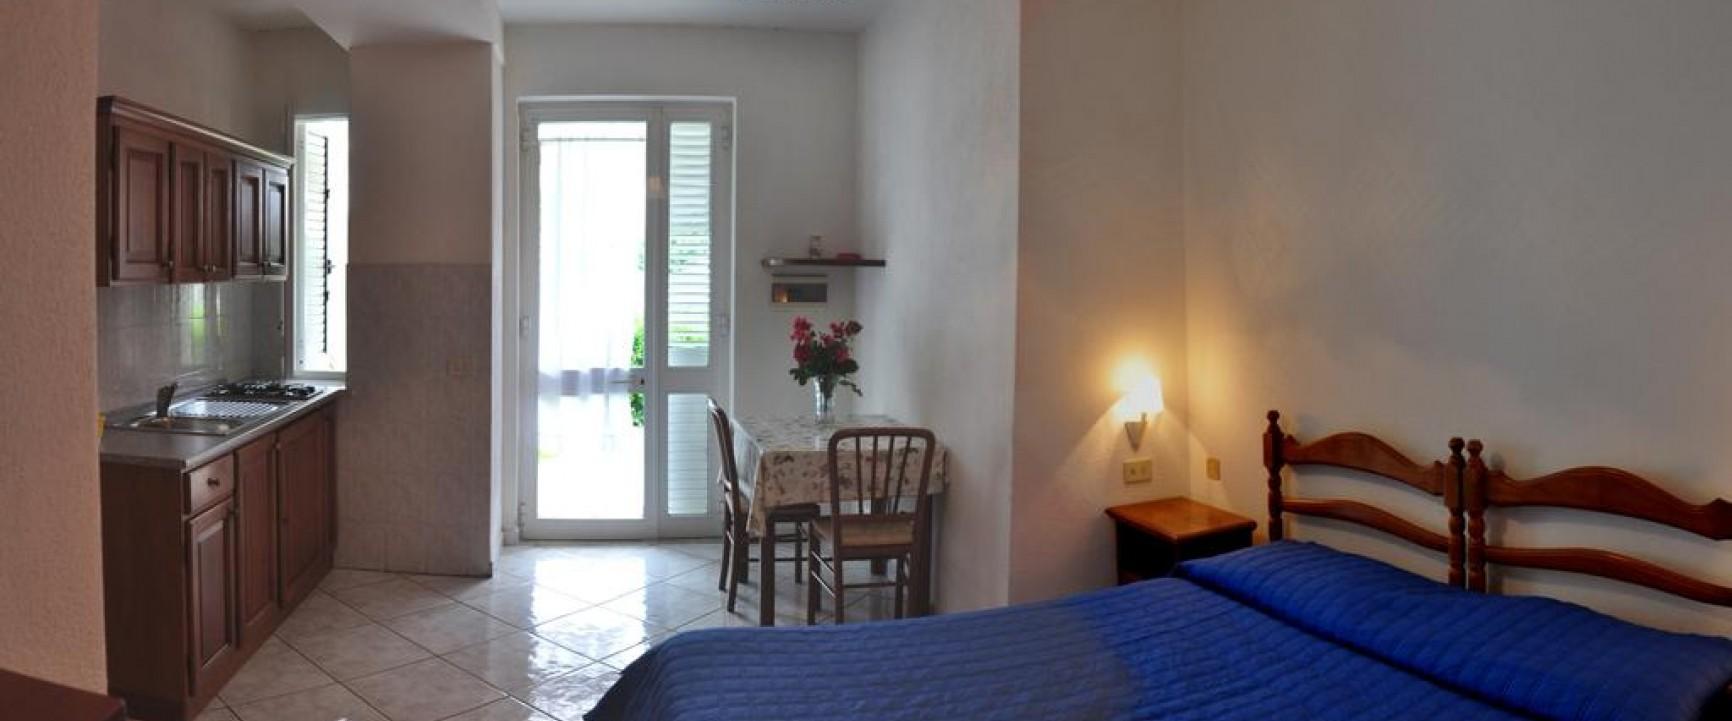 Hotel Residence Villa Teresa